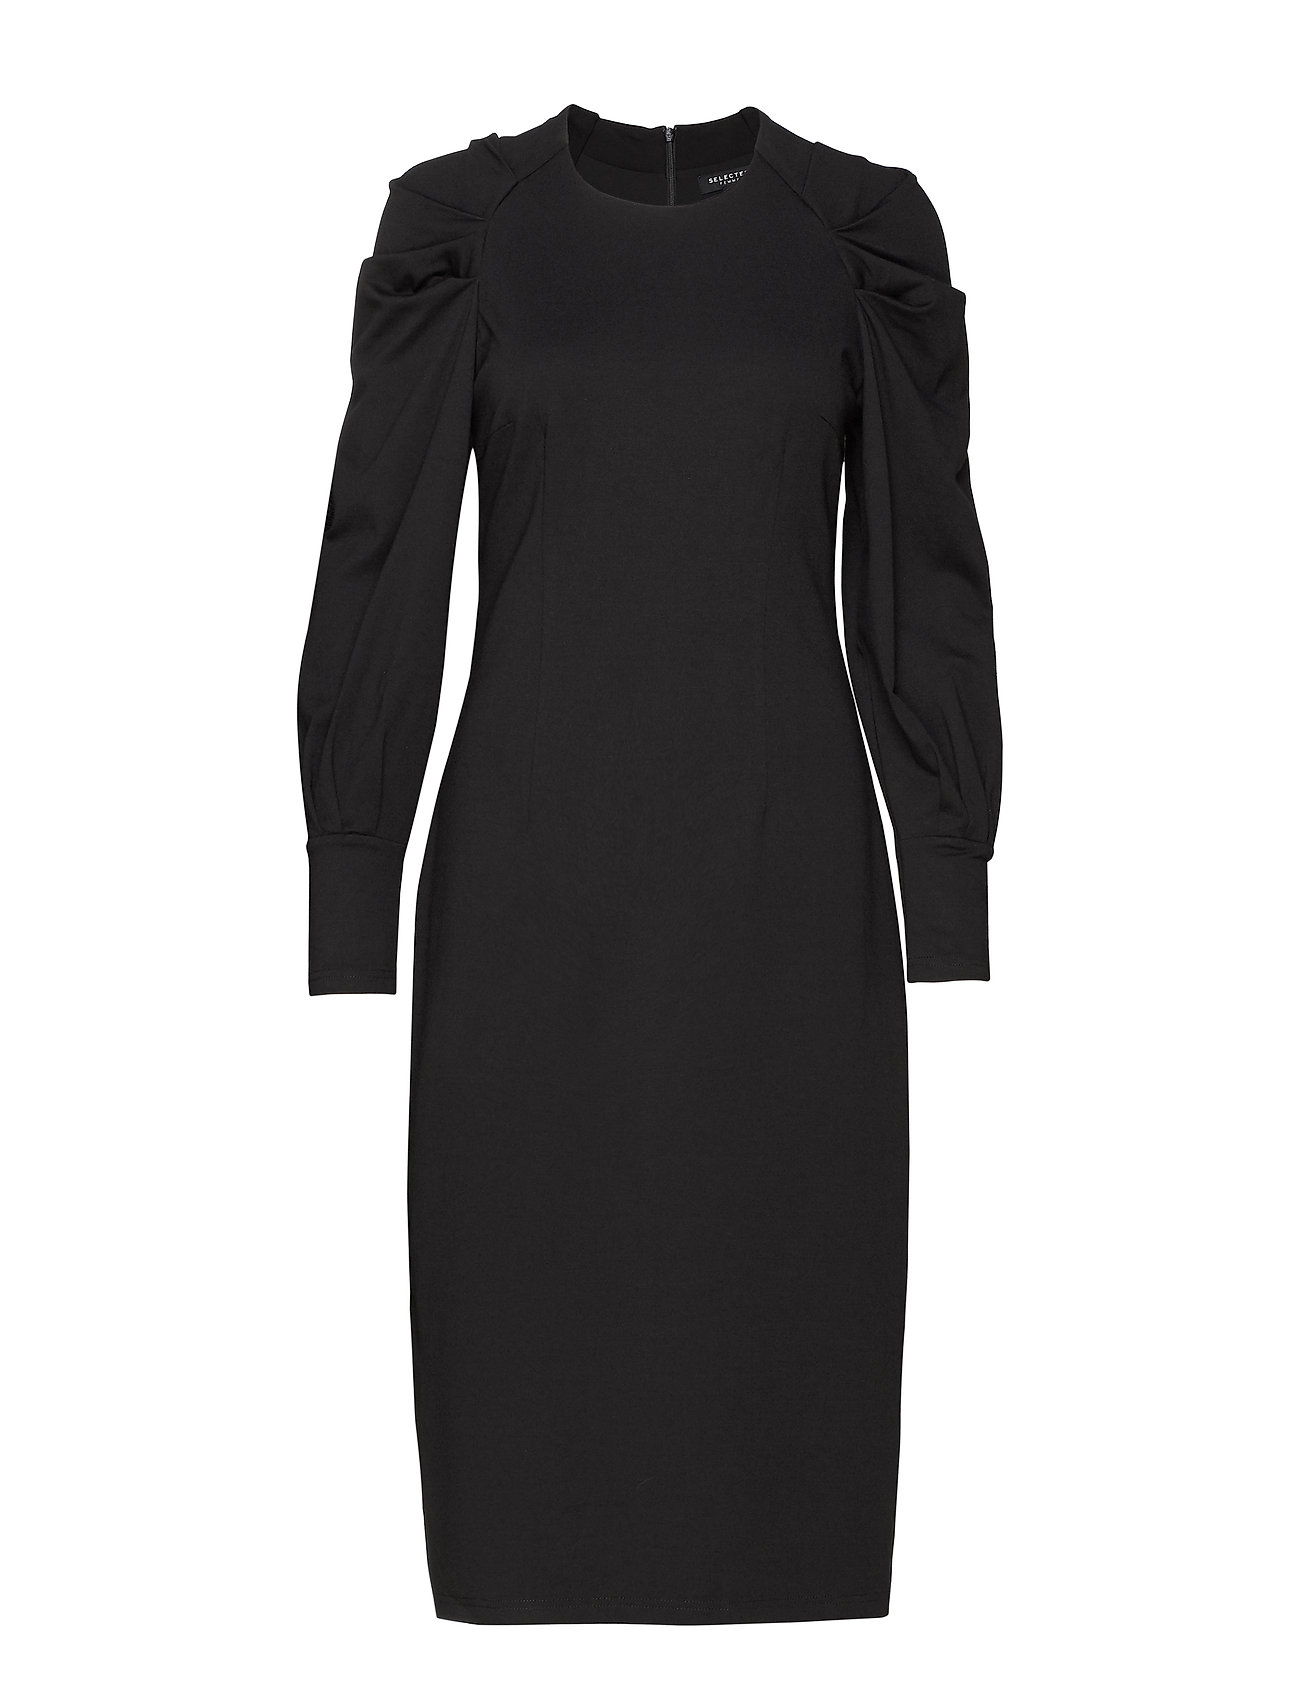 Selected Femme SLFTHORA LOUISE DRESS B - BLACK